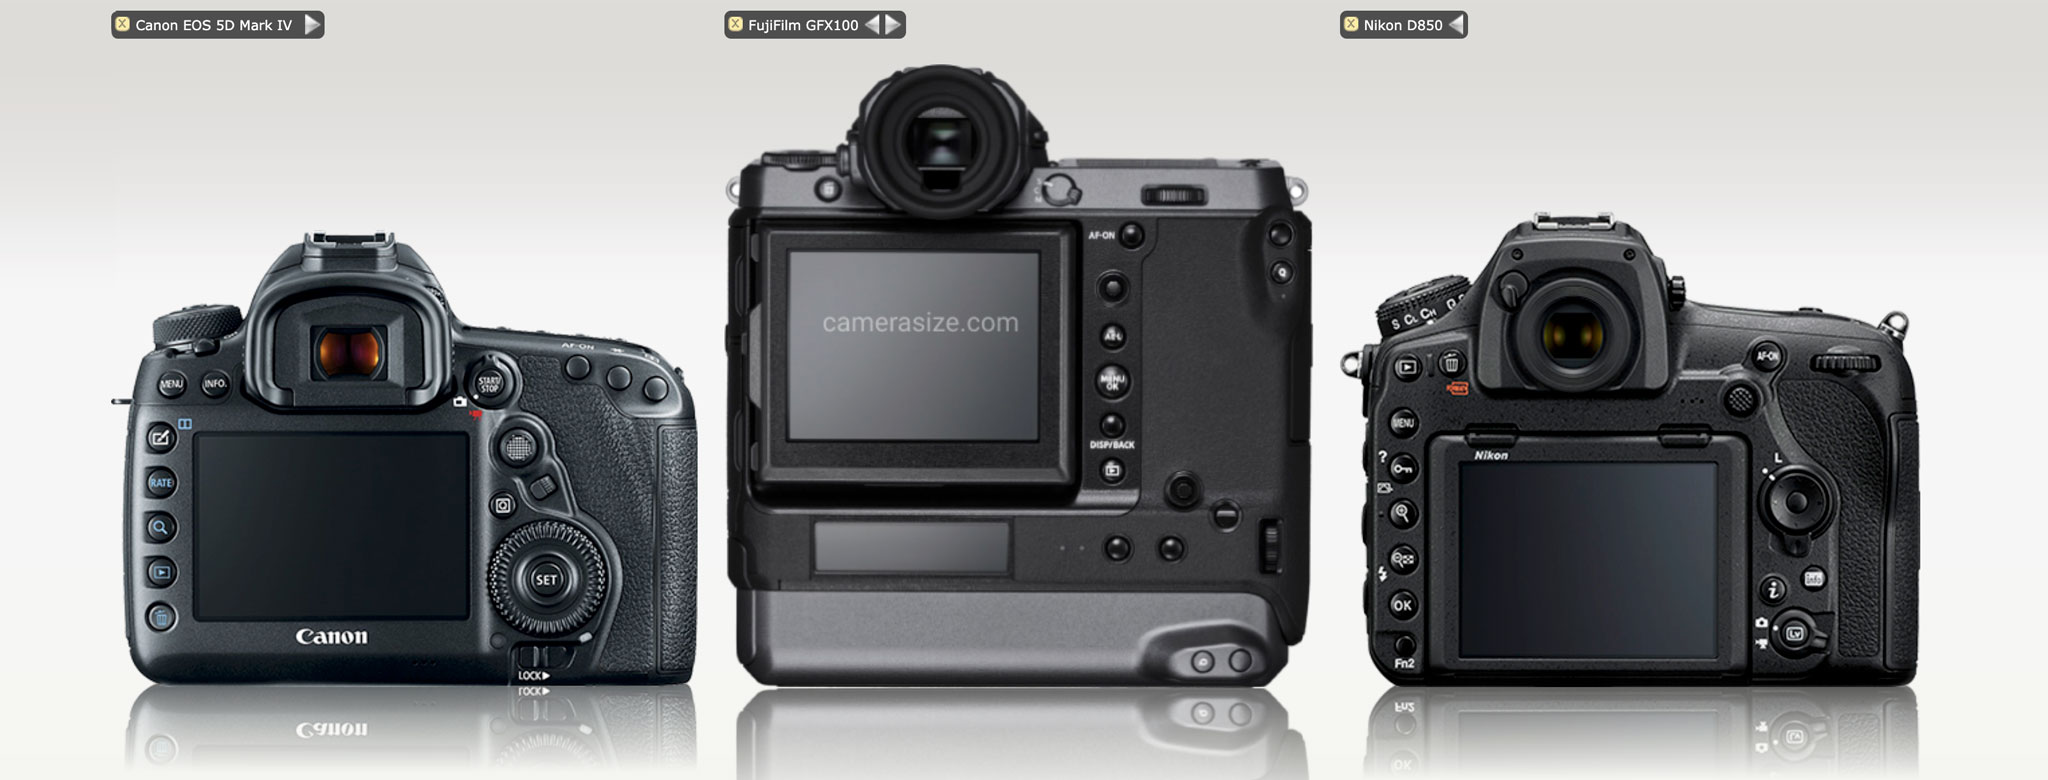 5DM4-GFX100-D850-sau.jpg